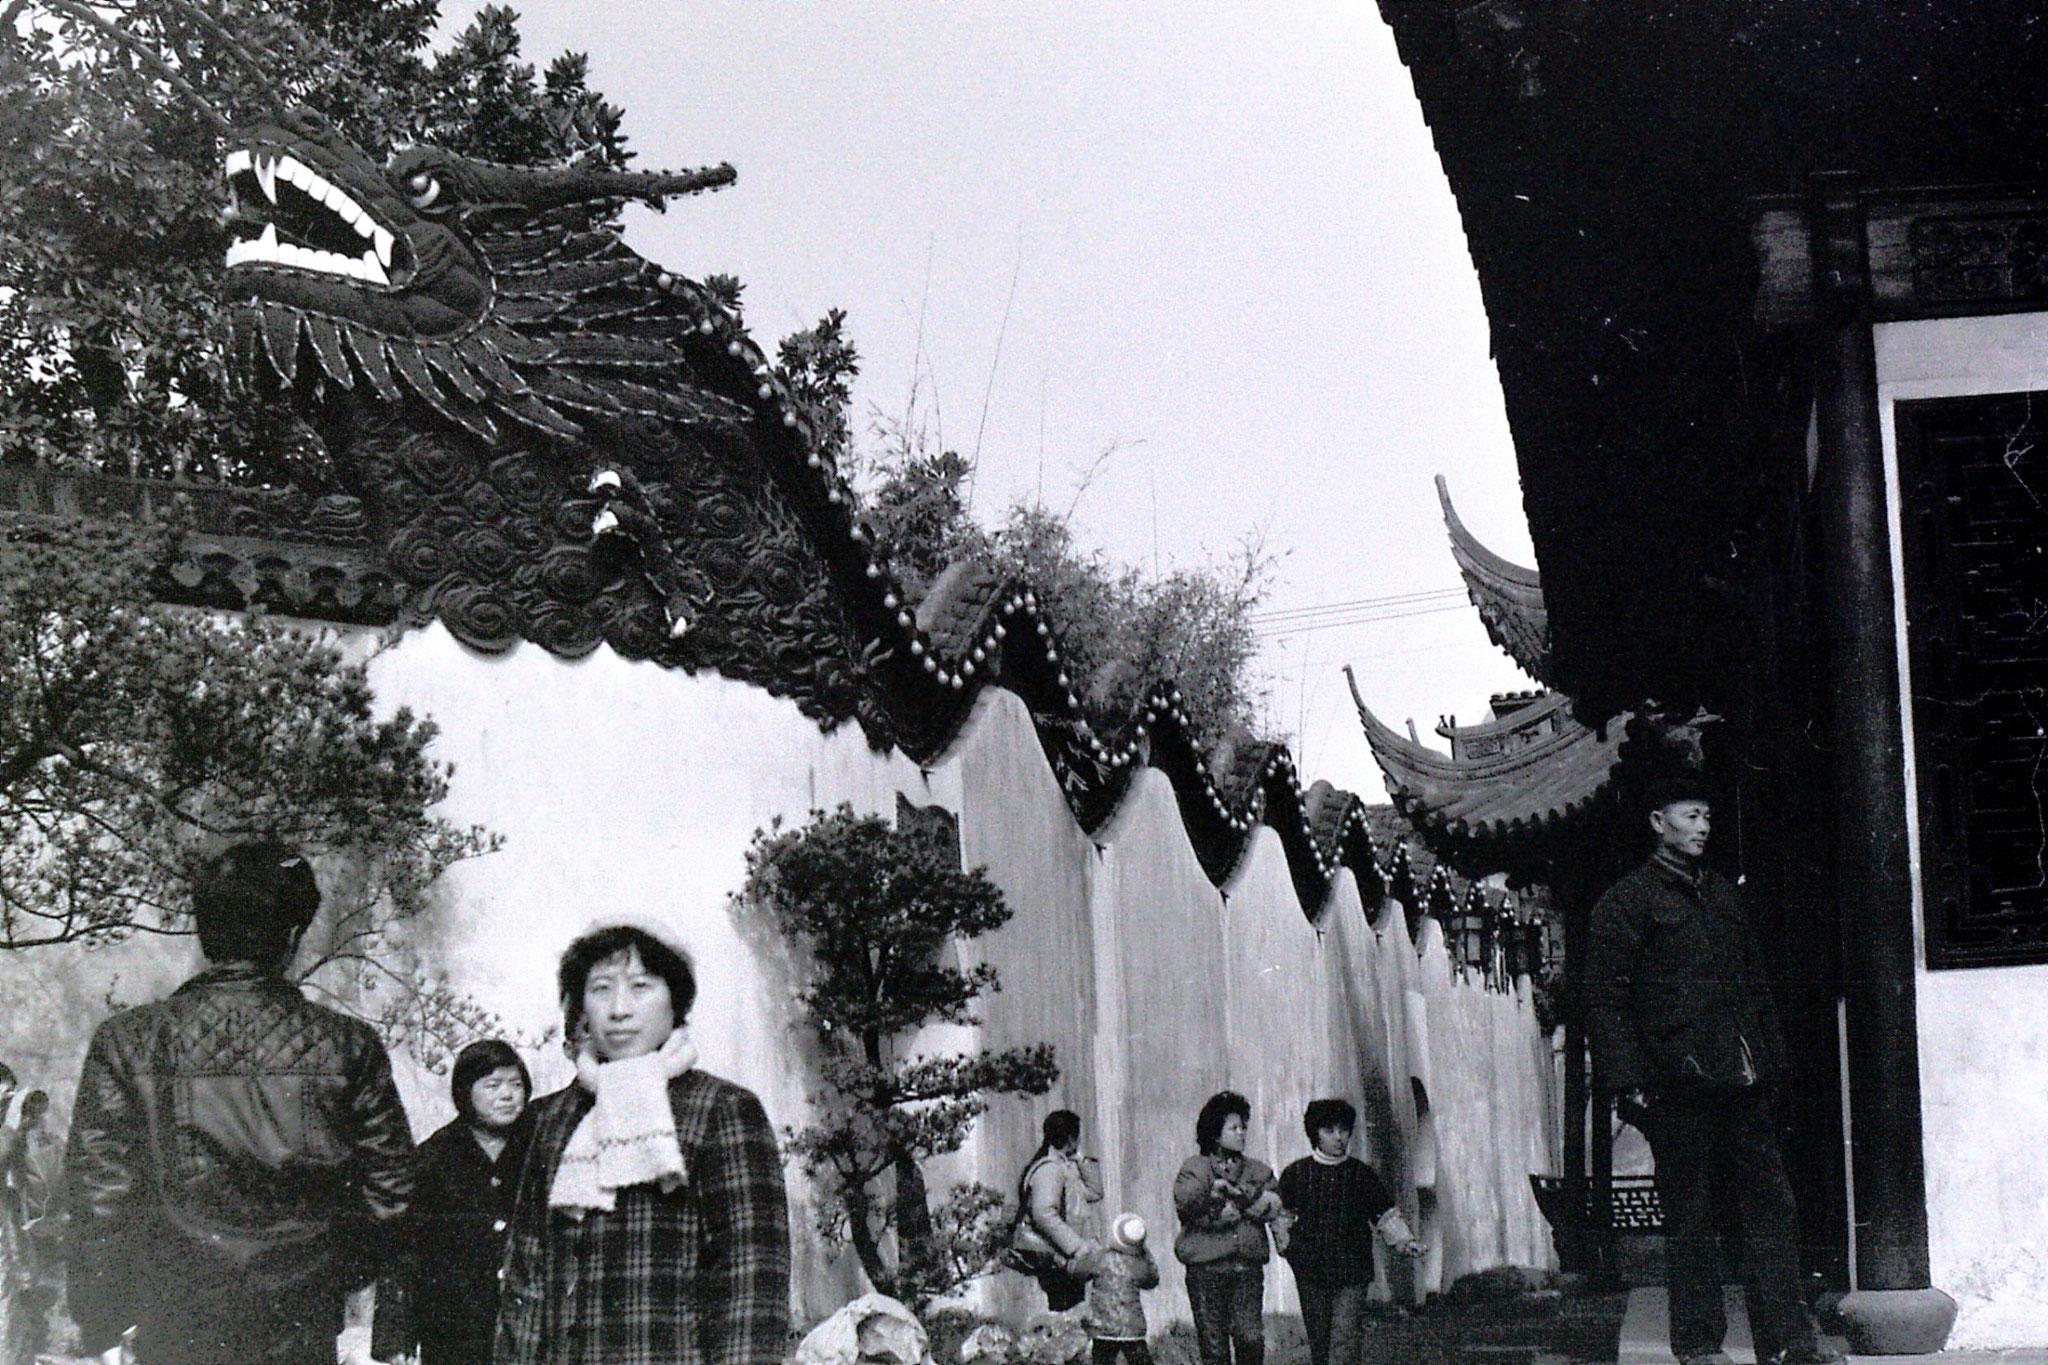 10/2/1989: 2: Shanghai Yuyuan Gardens